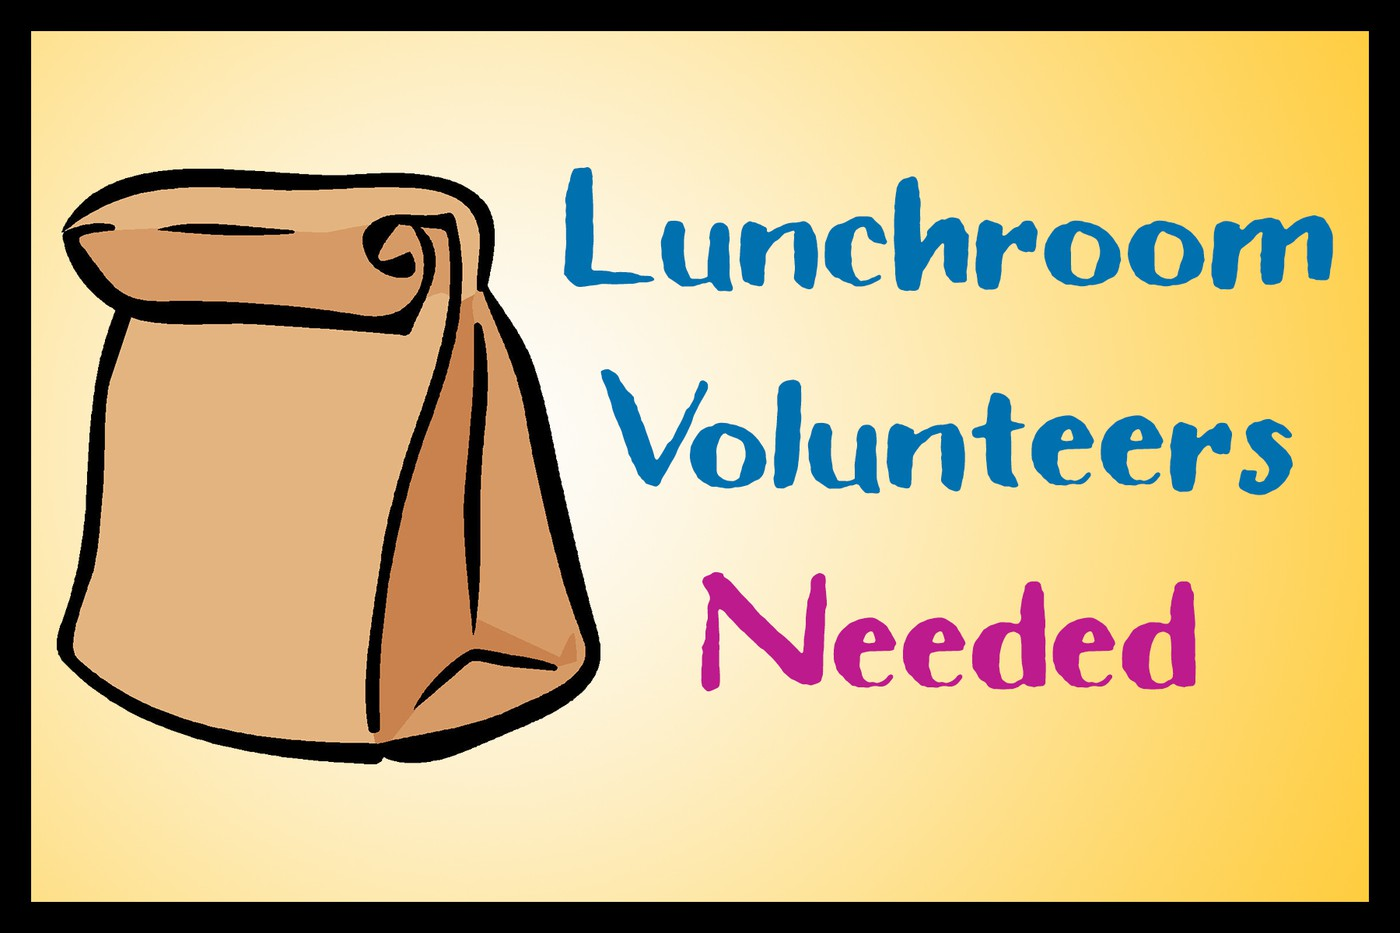 Image result for Lunchroom volunteers